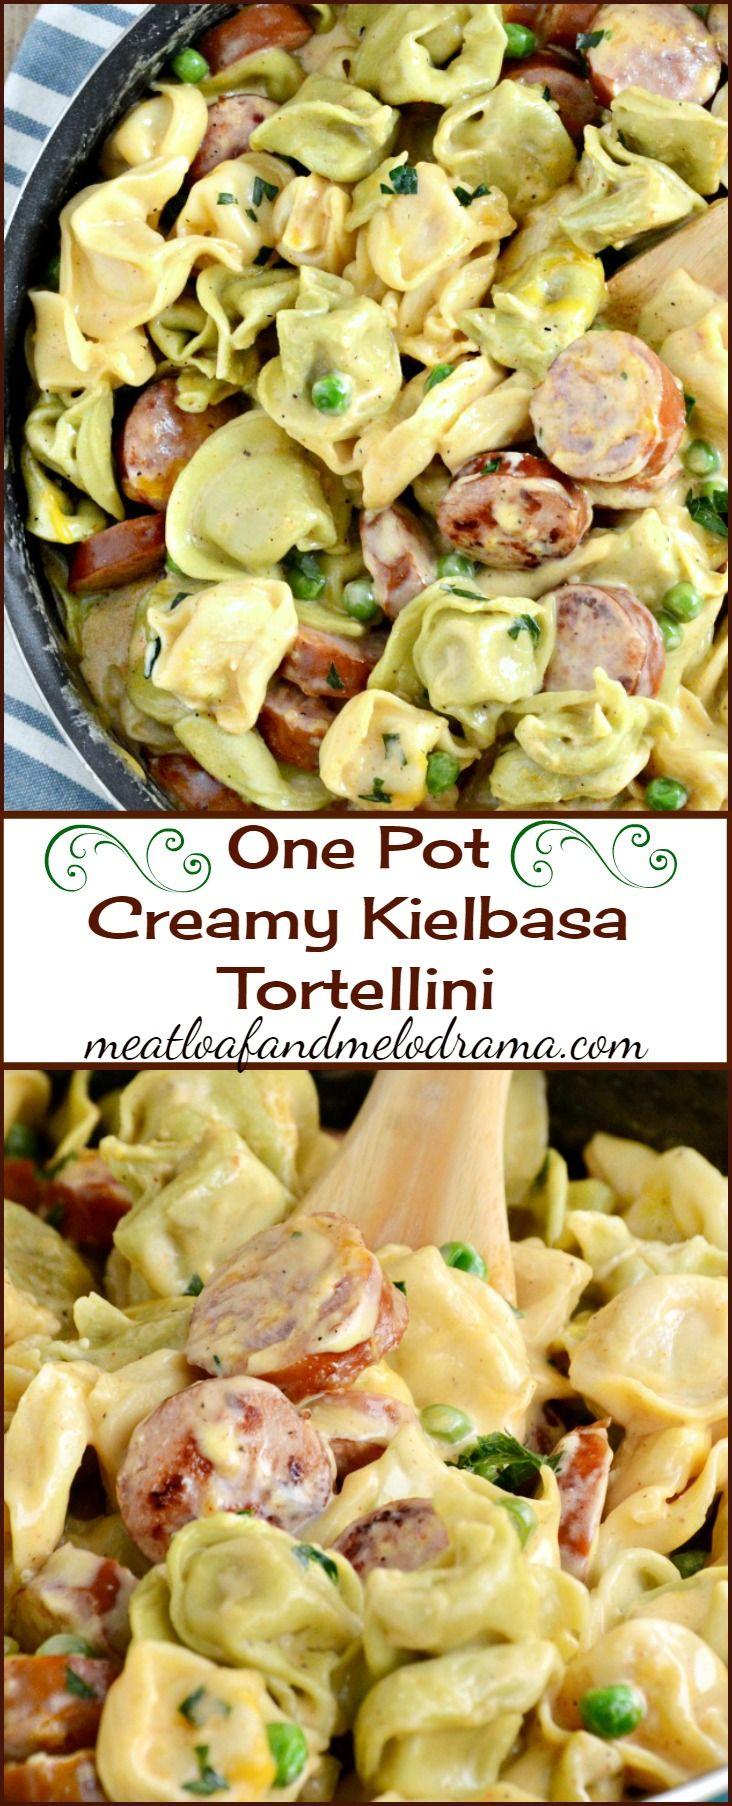 One Pot Creamy Kielbasa Tortellini